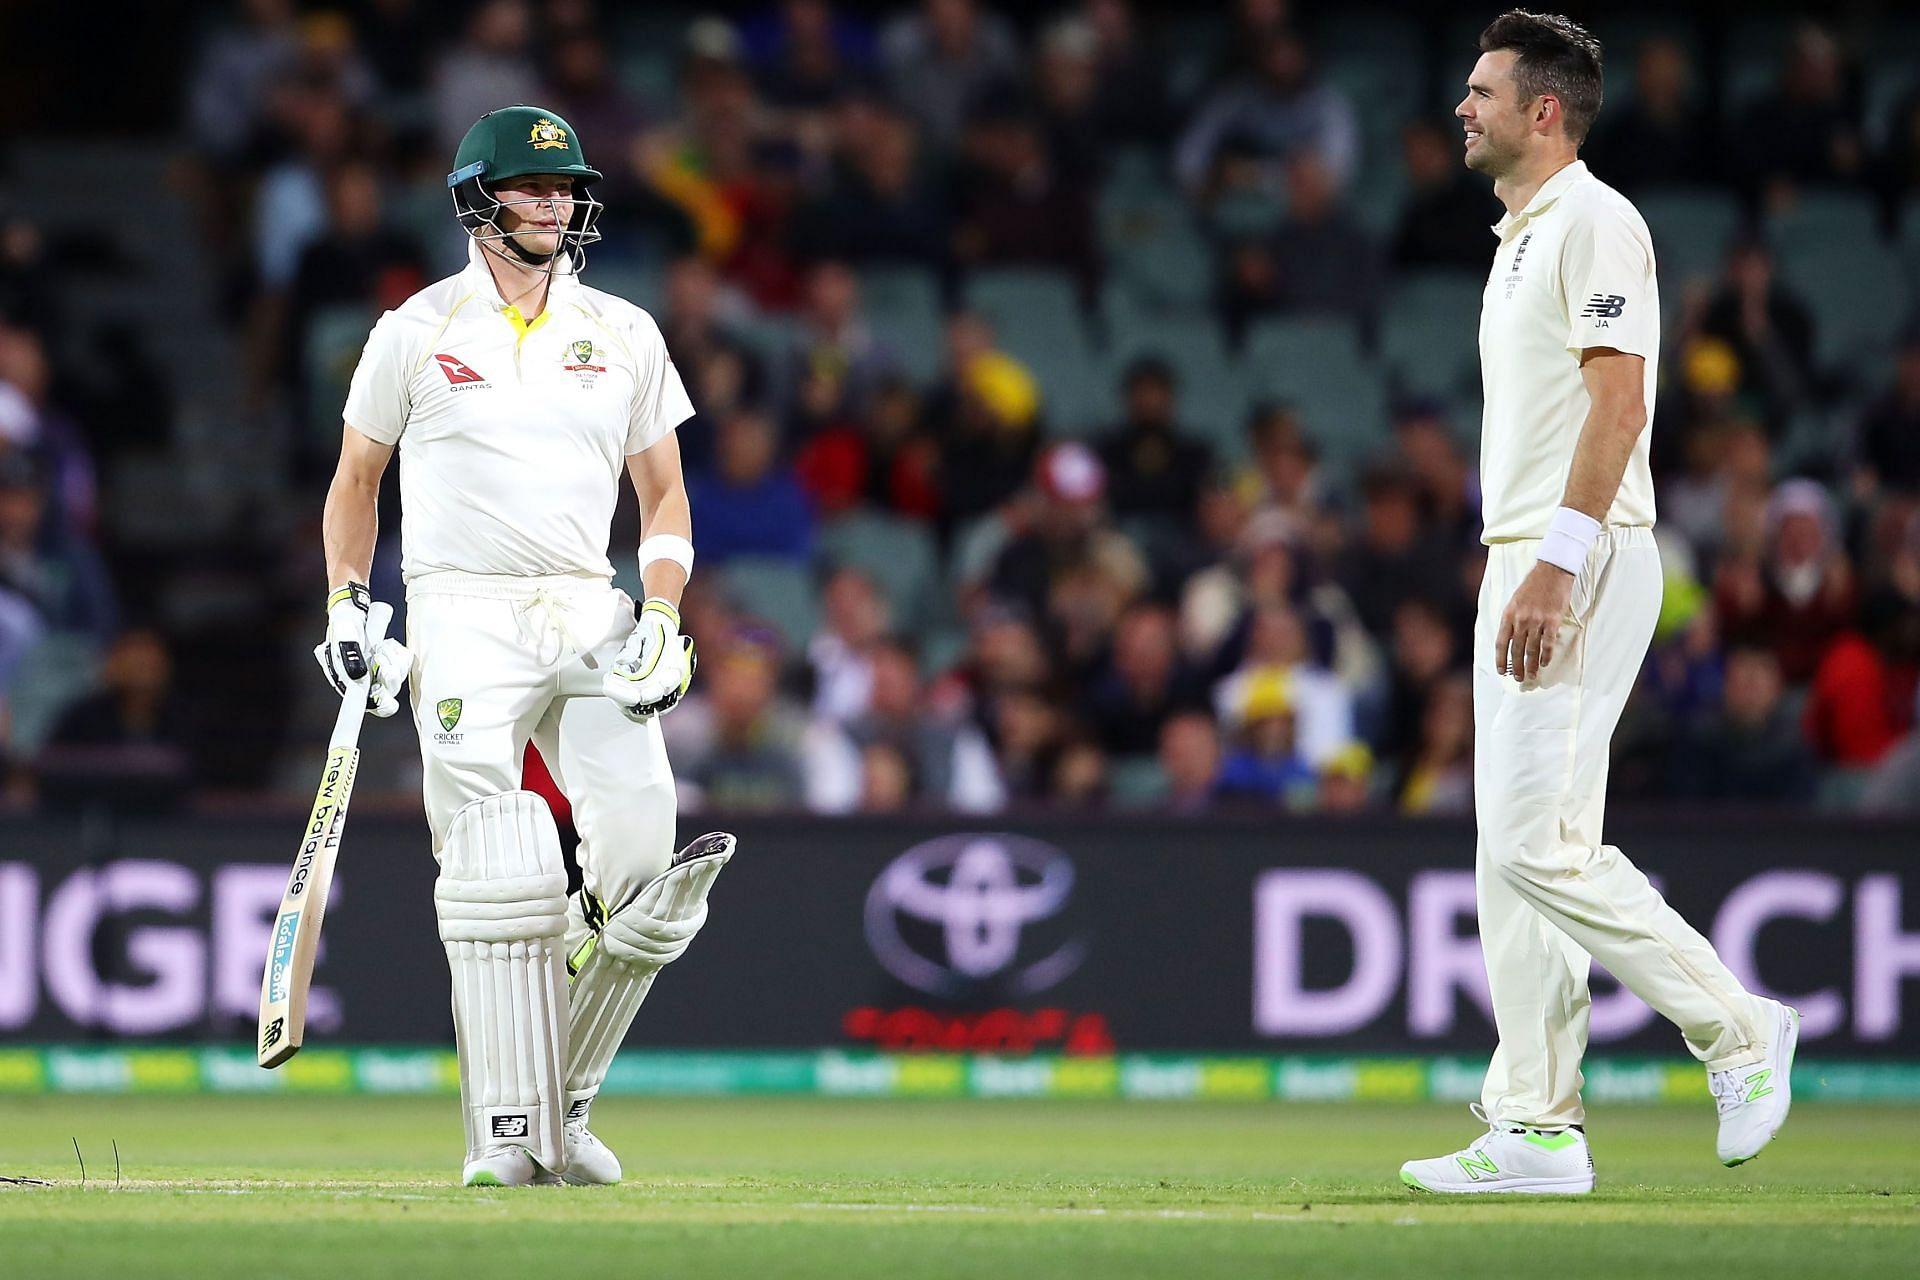 Australia v England - Second Test: Day 3